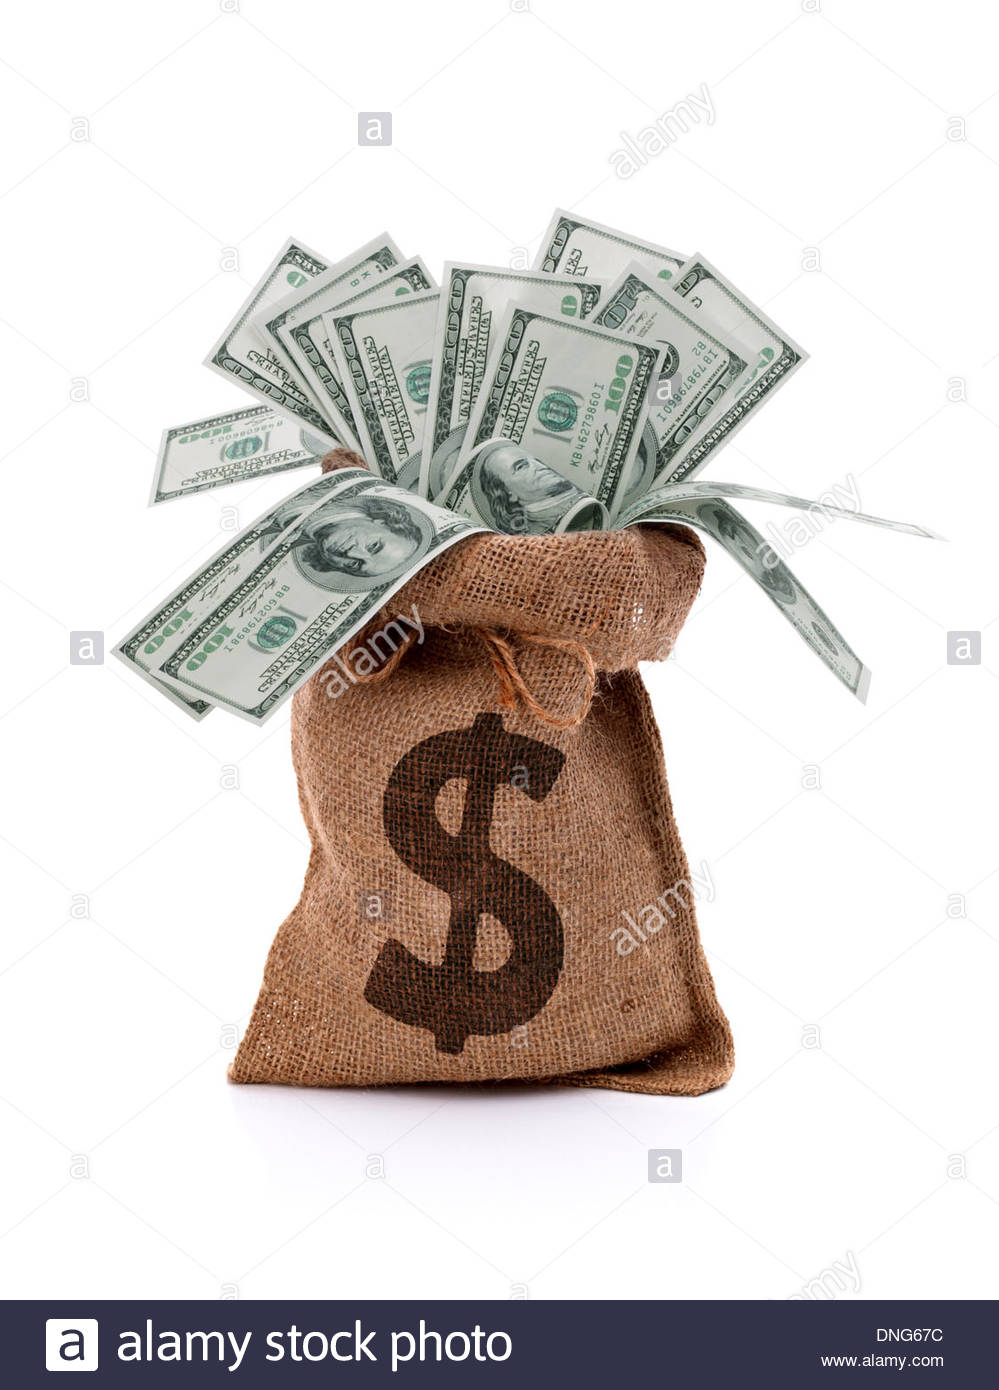 Money bag - Stock Image